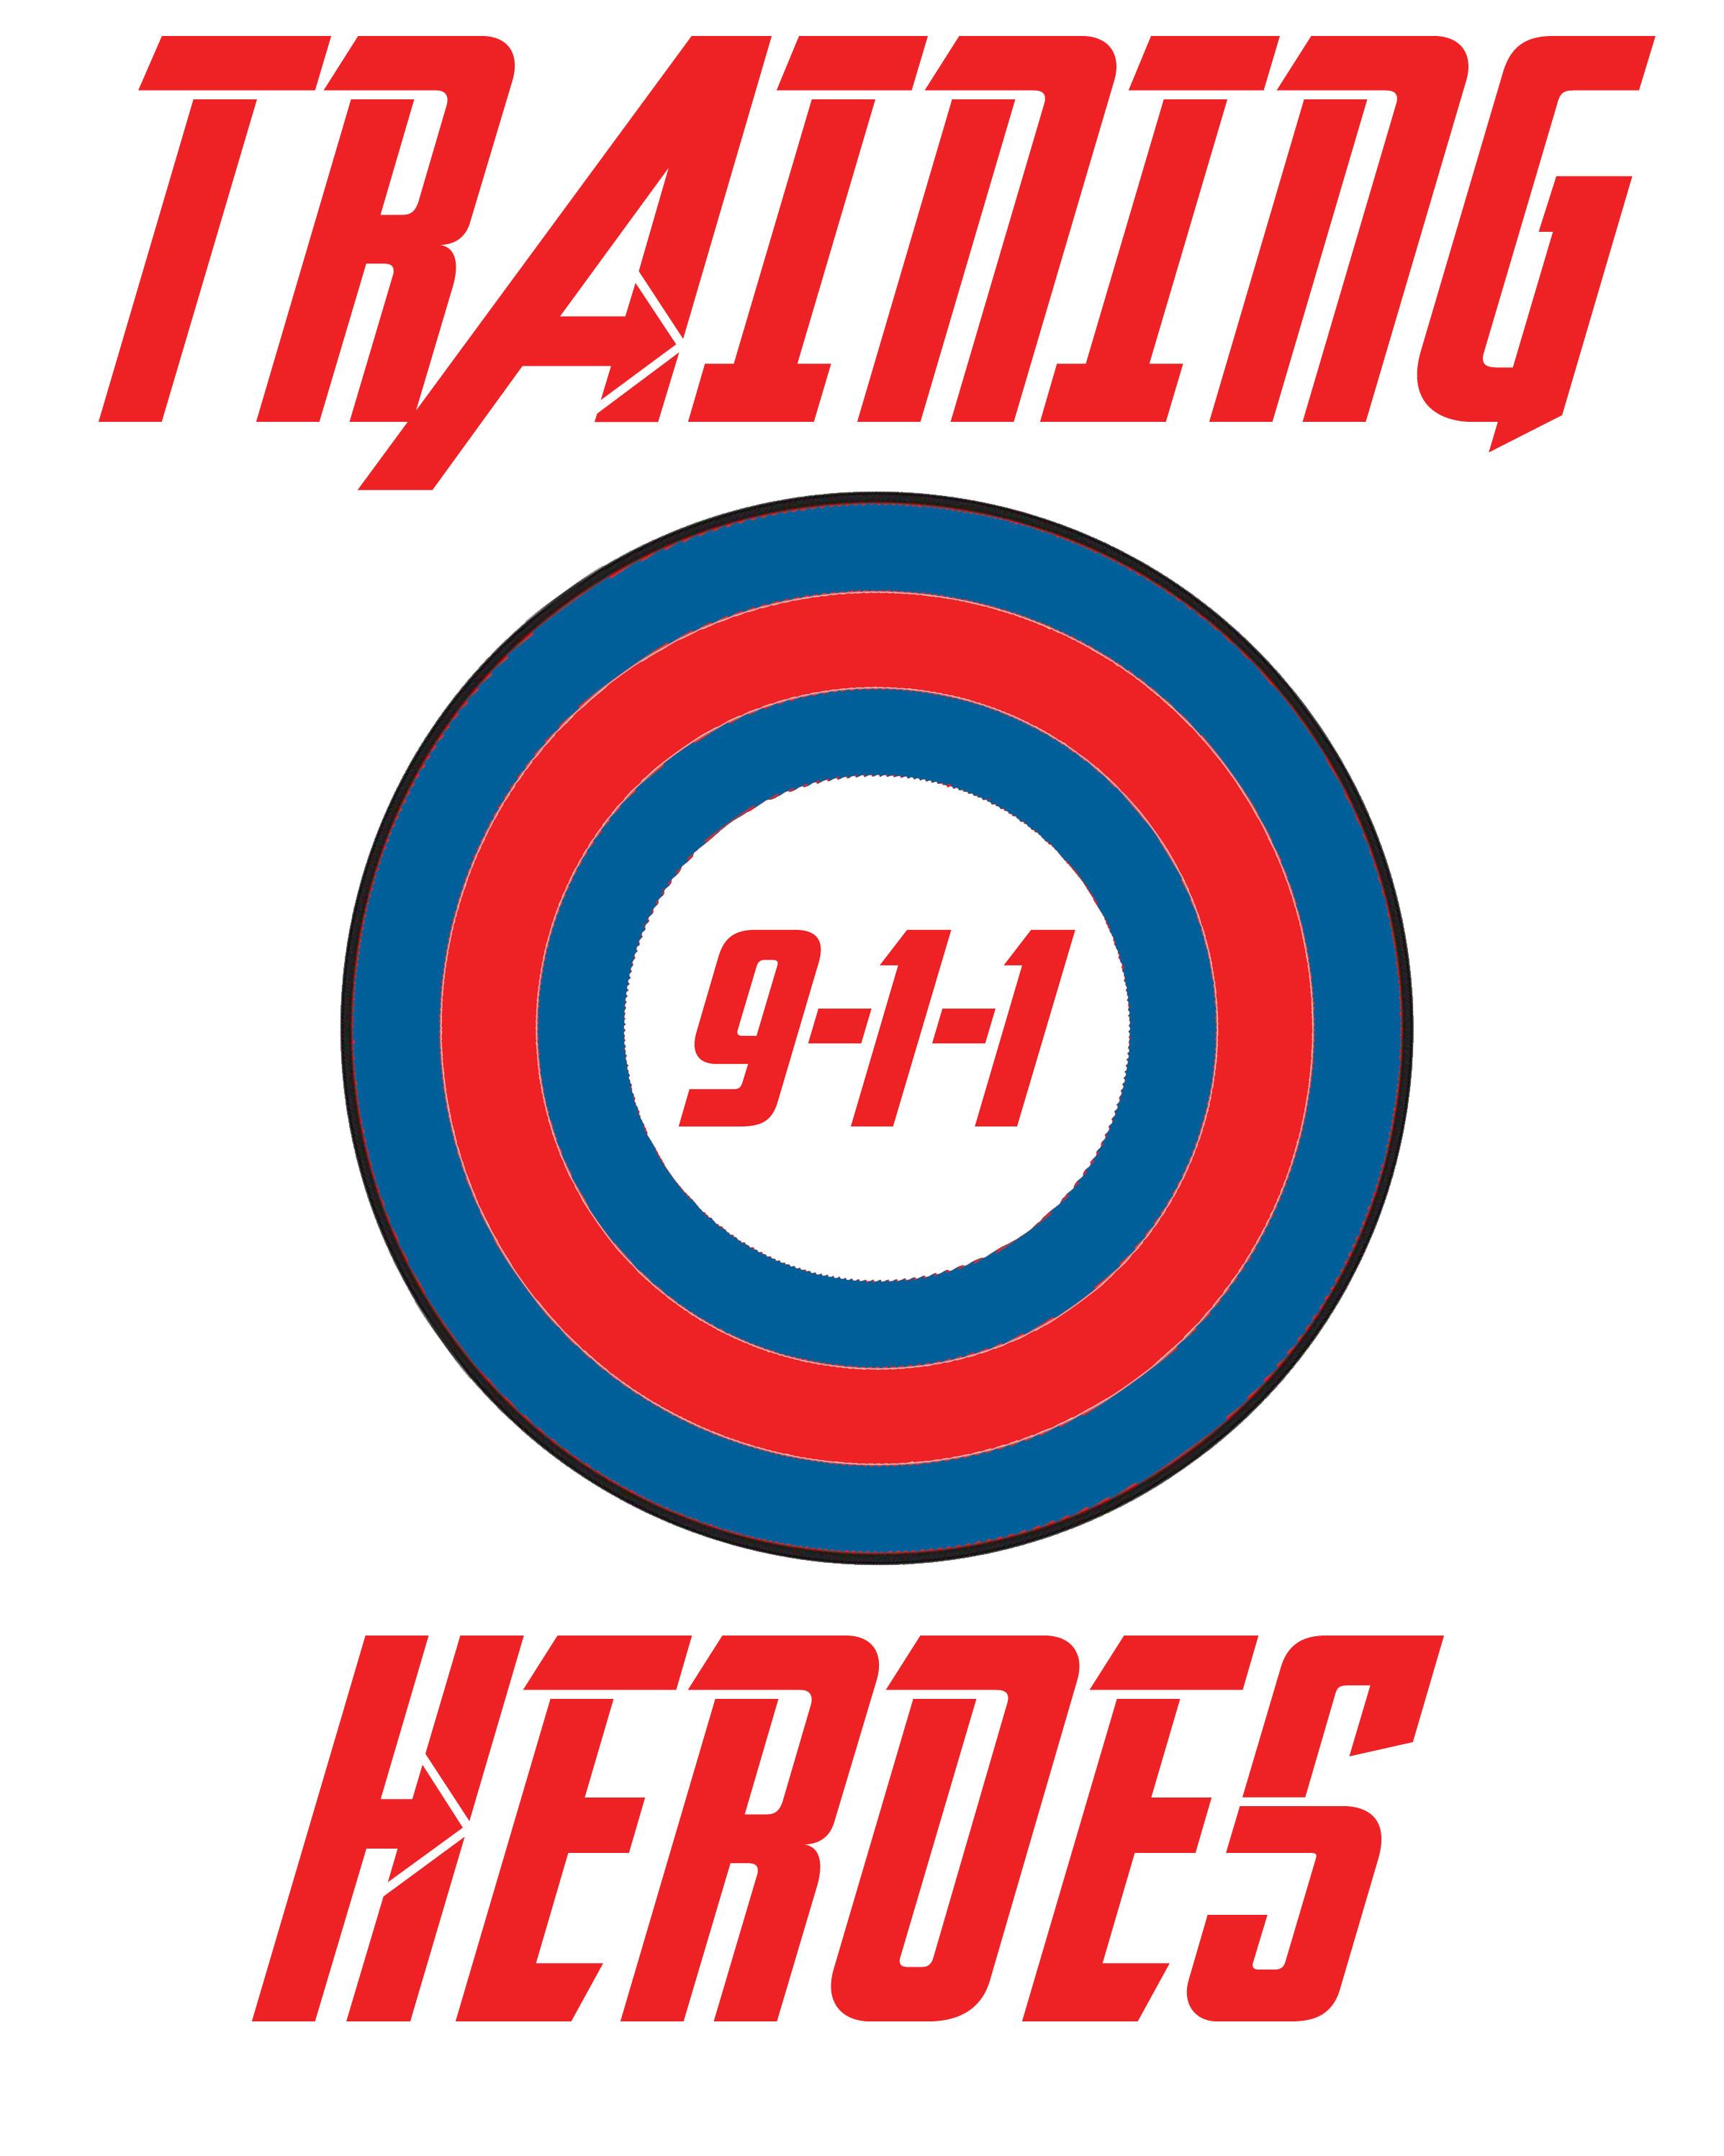 Training 911 heroes